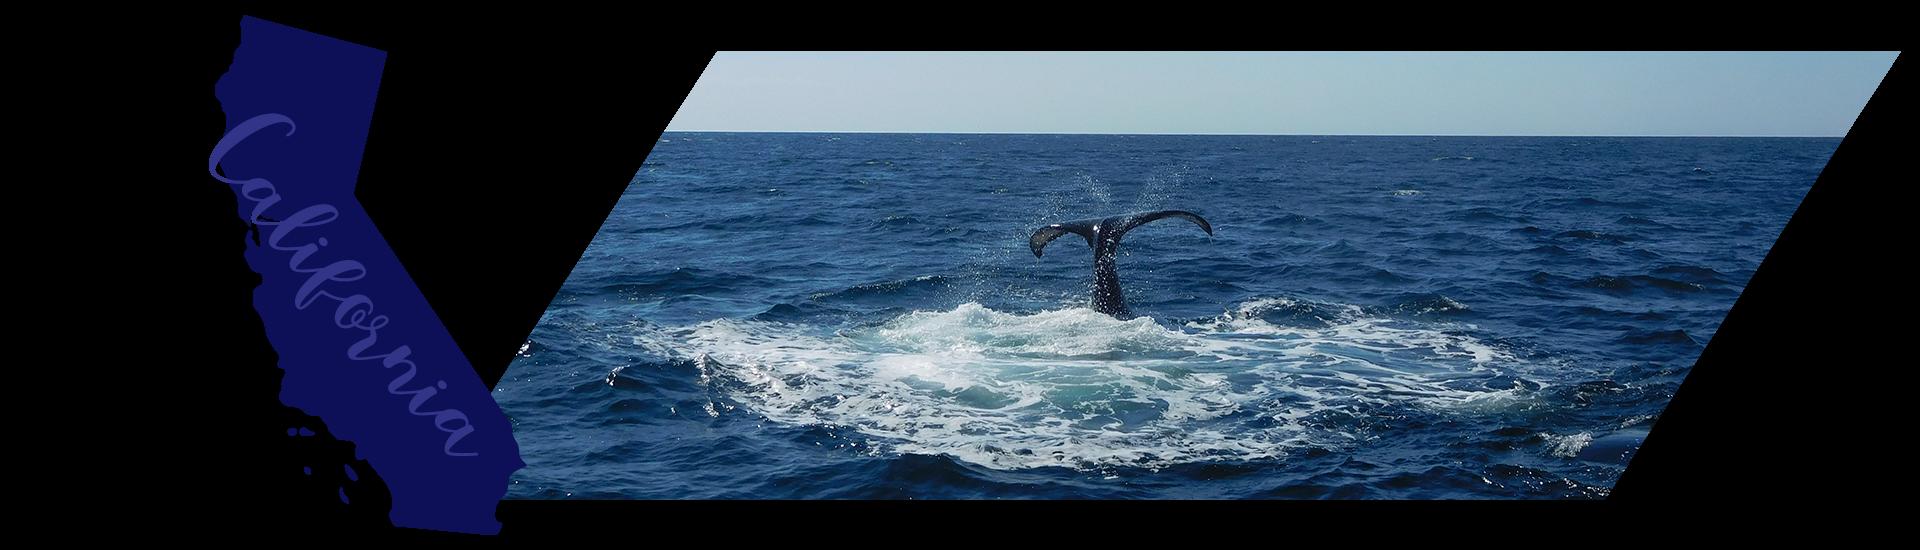 Whale watching in Santa Barbara, California